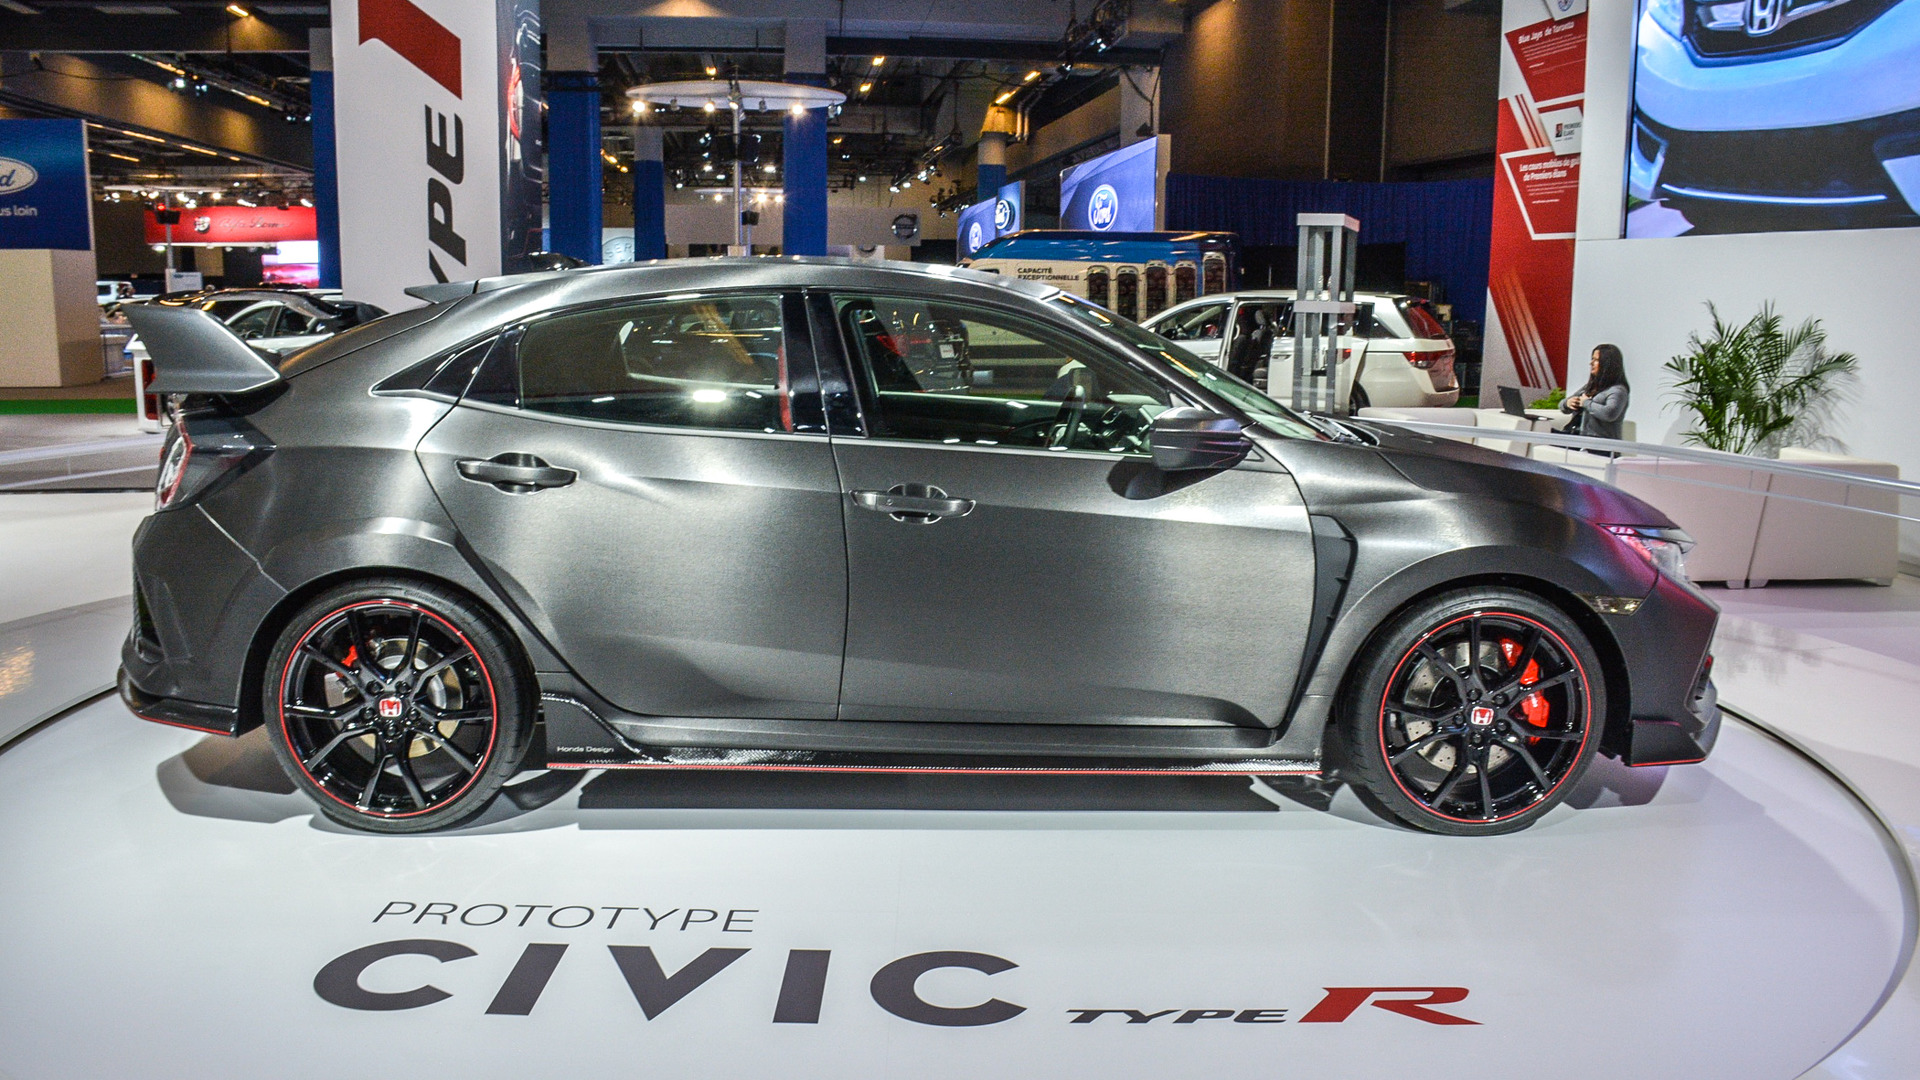 honda civic type r prototype interior revealed in montreal honda civic type r prototype interior